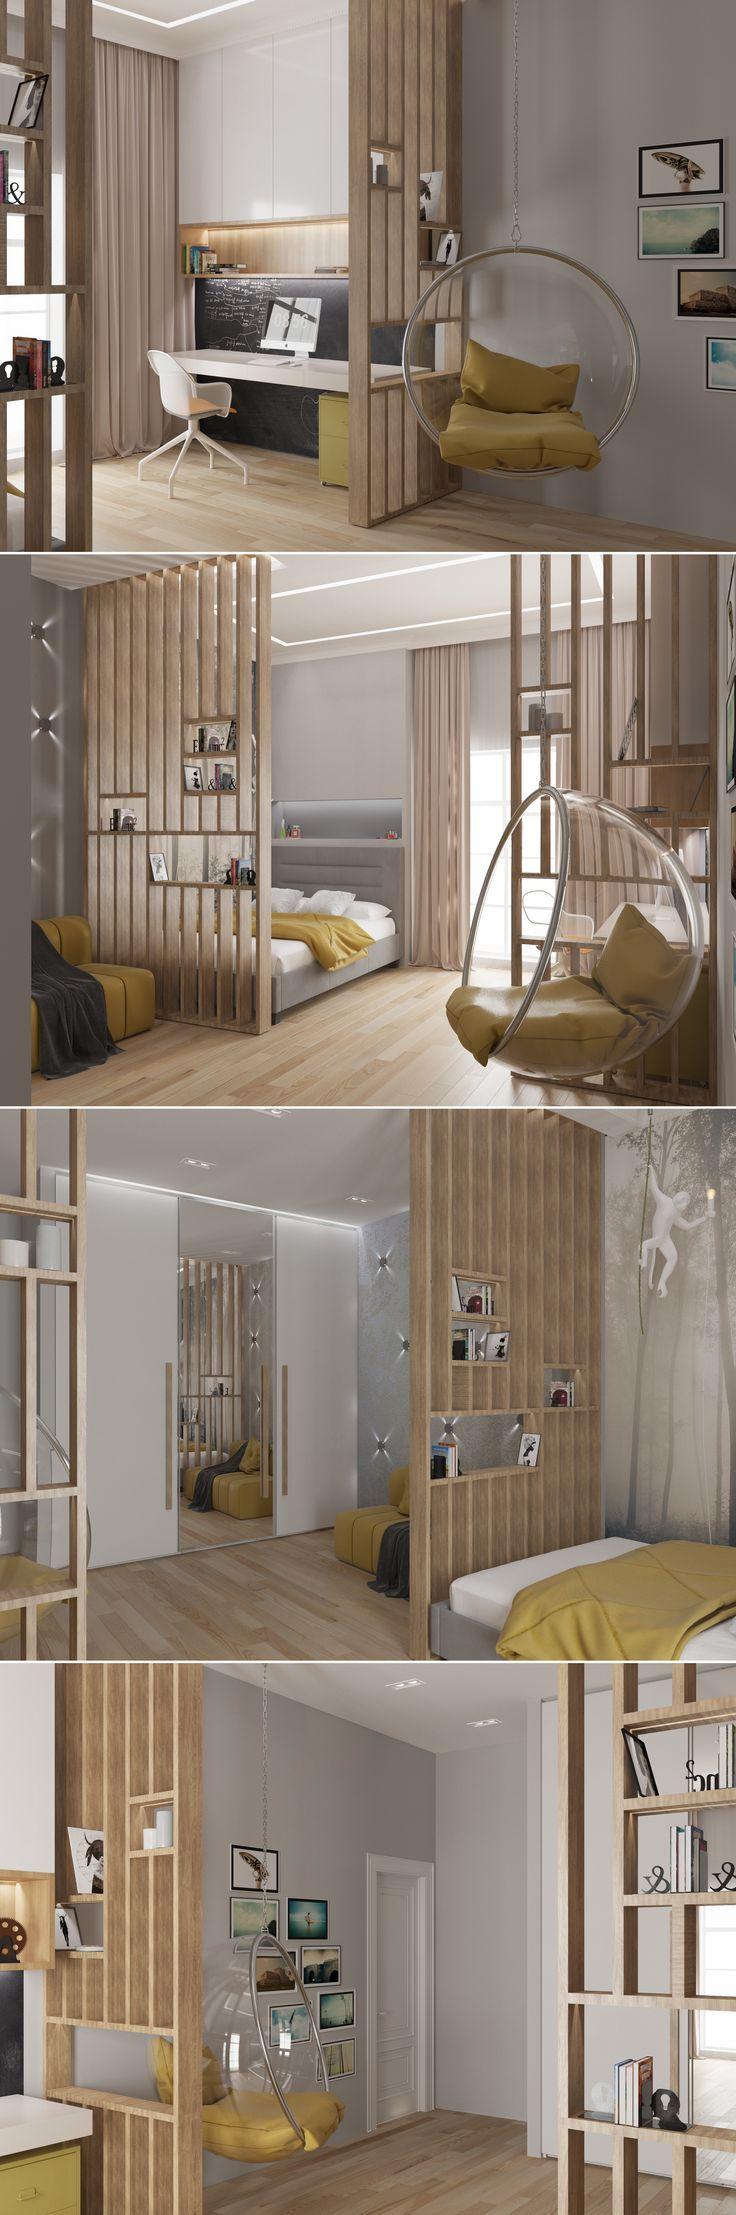 Very nice tiny apartment. Although really small, i…